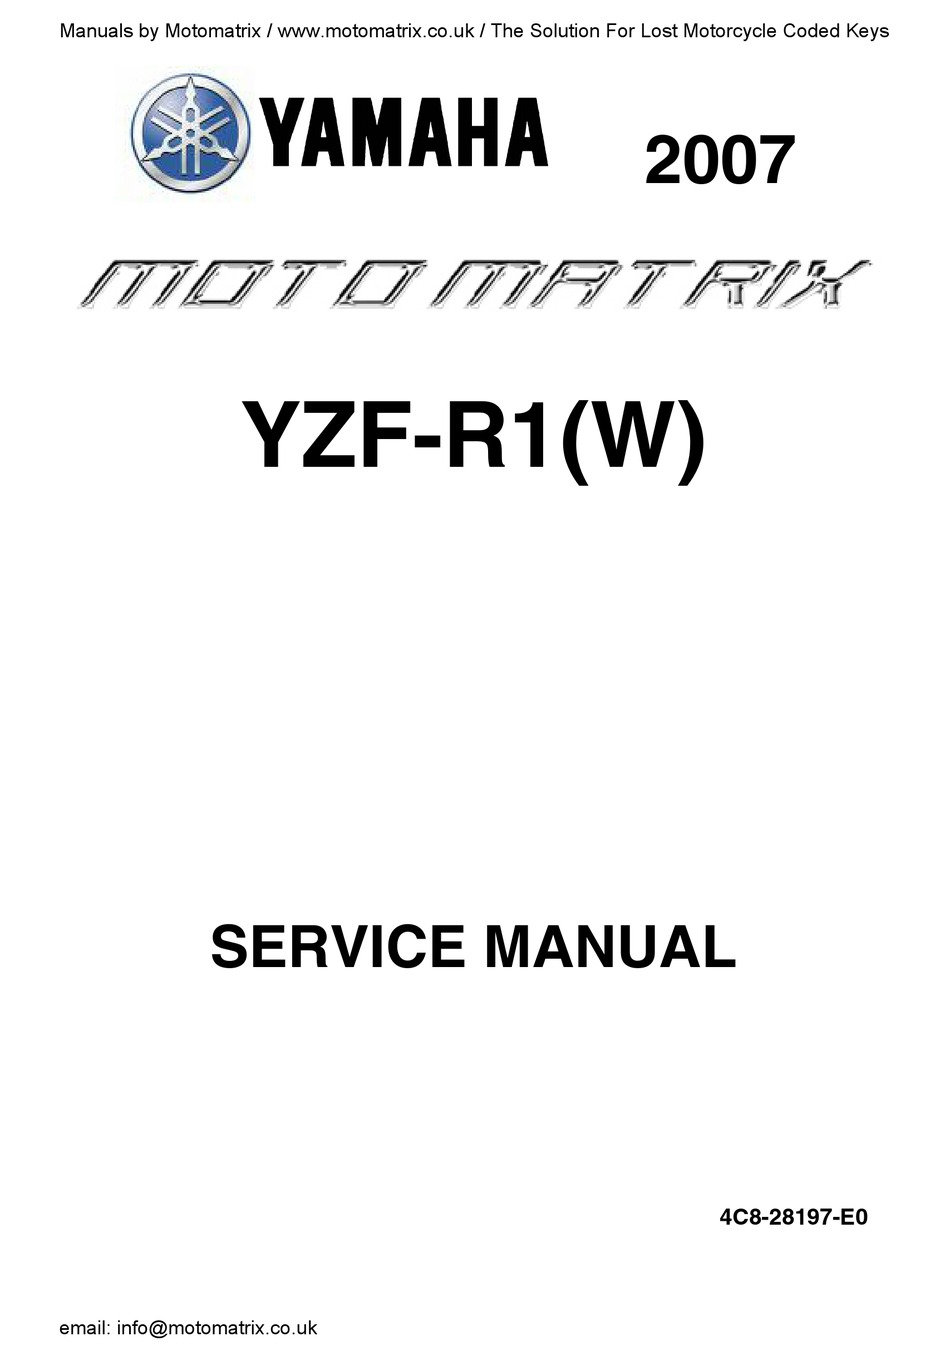 Yamaha Yzf R1 2007 Service Manual Pdf Download Manualslib